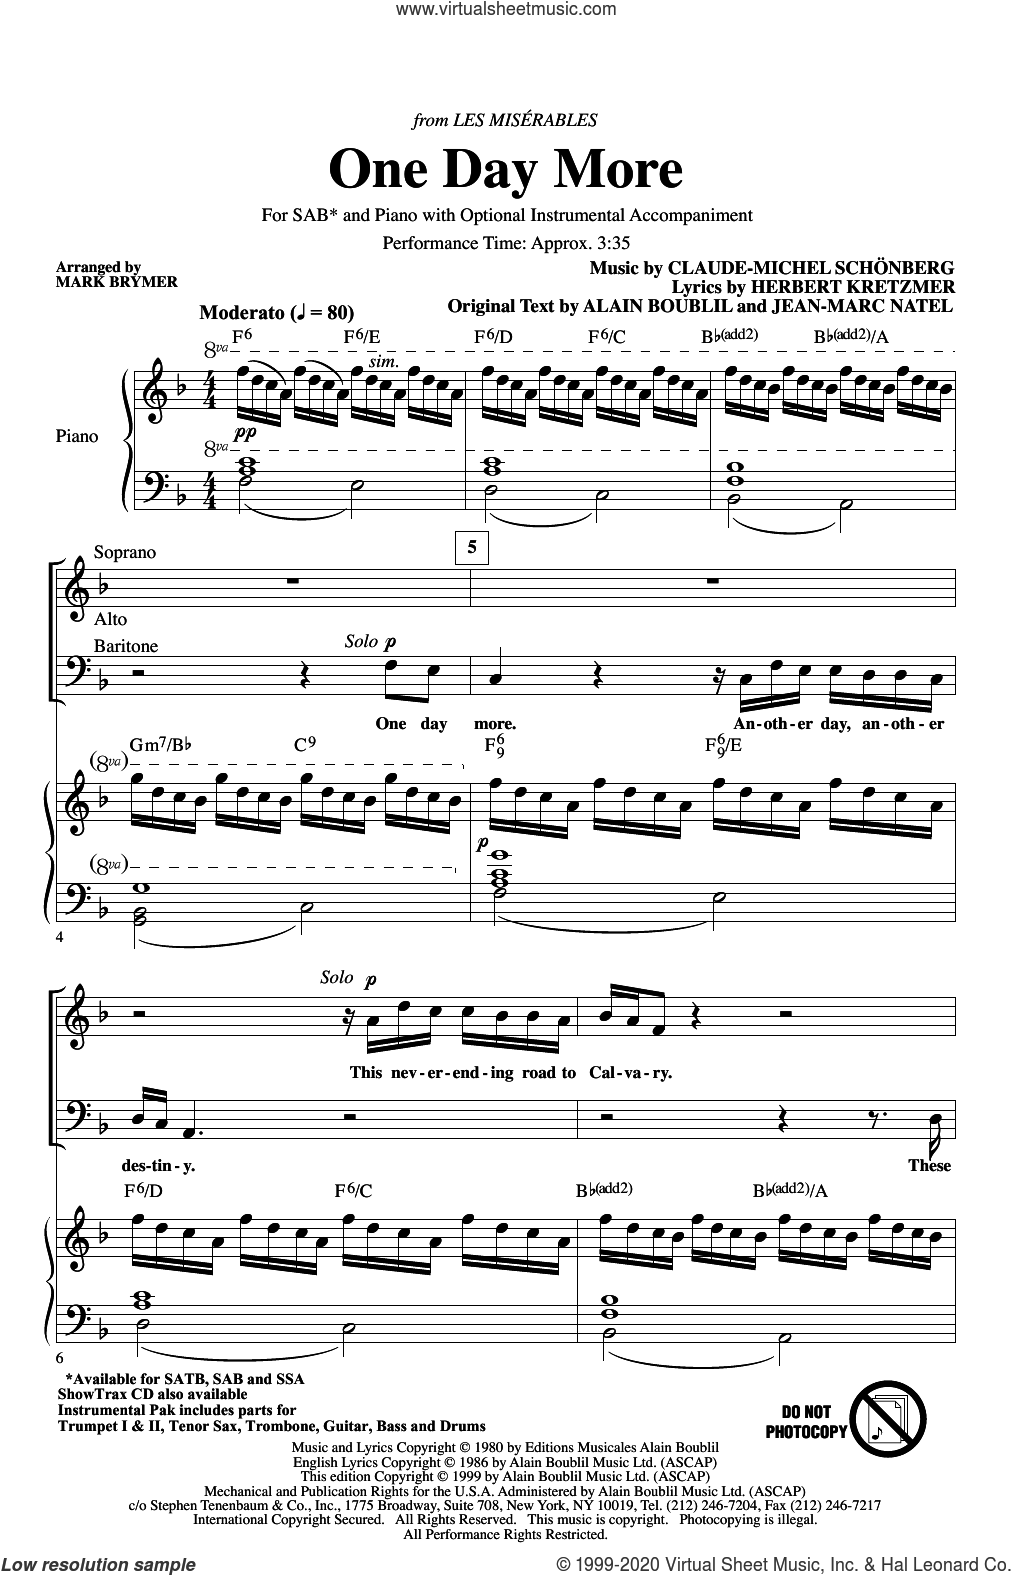 One Day More (from Les Miserables) (arr. Mark Brymer) sheet music for choir (SAB: soprano, alto, bass) by Alain Boublil, Mark Brymer, Boublil & Schonberg, Claude-Michel Schonberg, Herbert Kretzmer and Jean-Marc Natel, intermediate skill level